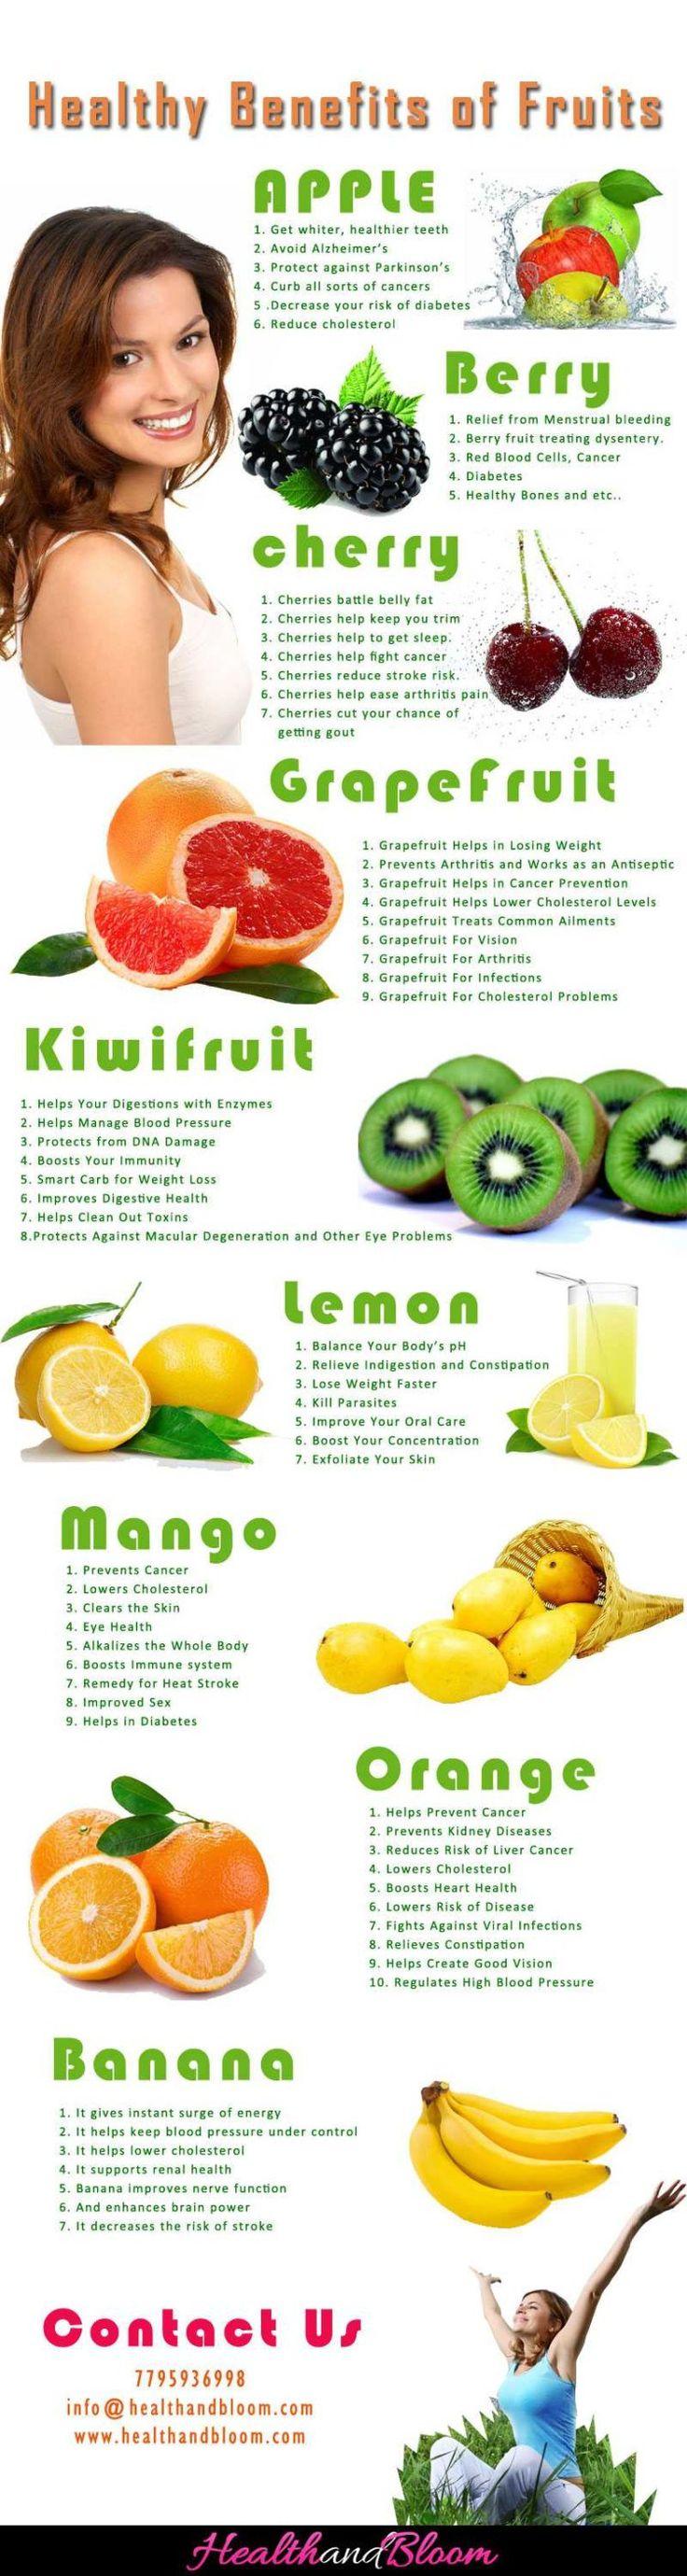 health-benefits-of-fruits-infographic.jpg 750×2,812 pixels